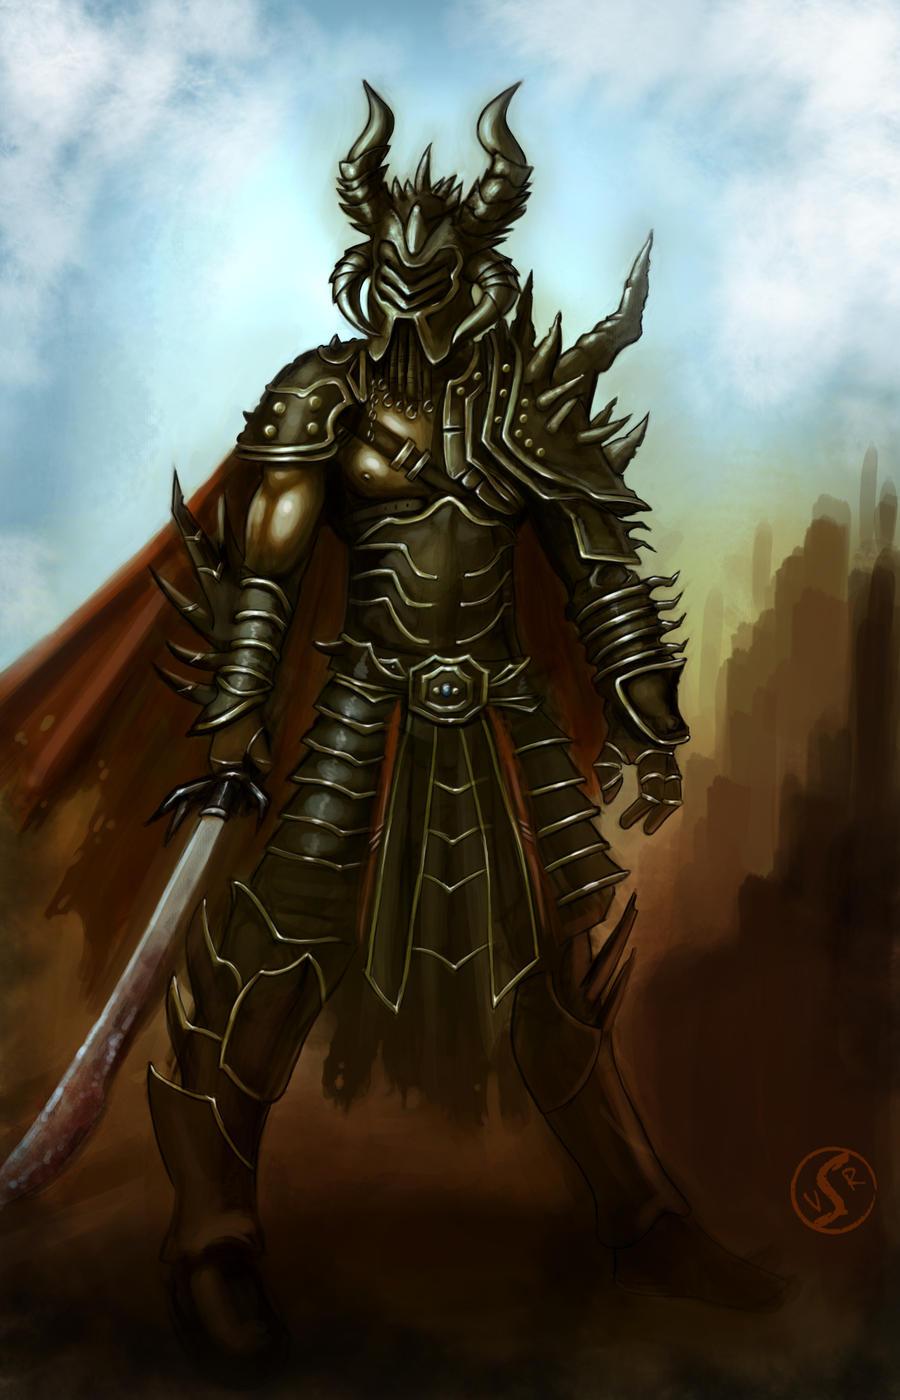 Dark warlord concept design by WackoShirow